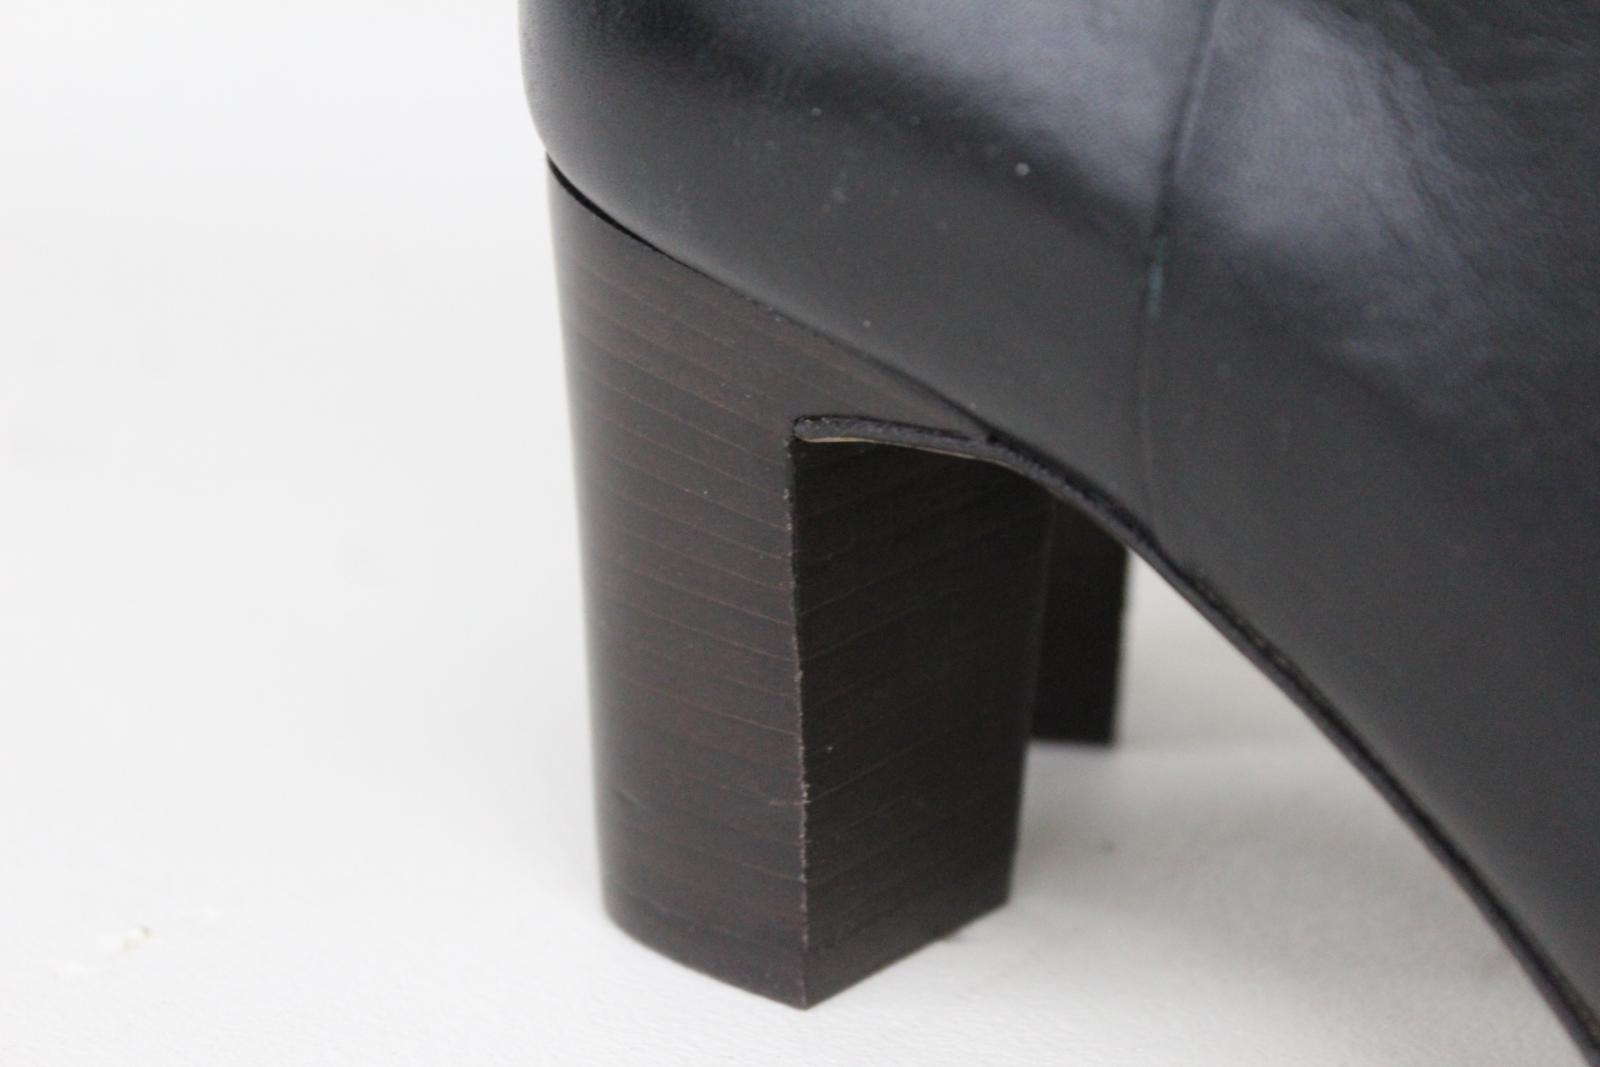 Hobbs-Senoras-Rodilla-Tacon-Maya-Cuero-Negro-Botas-De-Montar-UK8-EU41-Nuevo miniatura 5